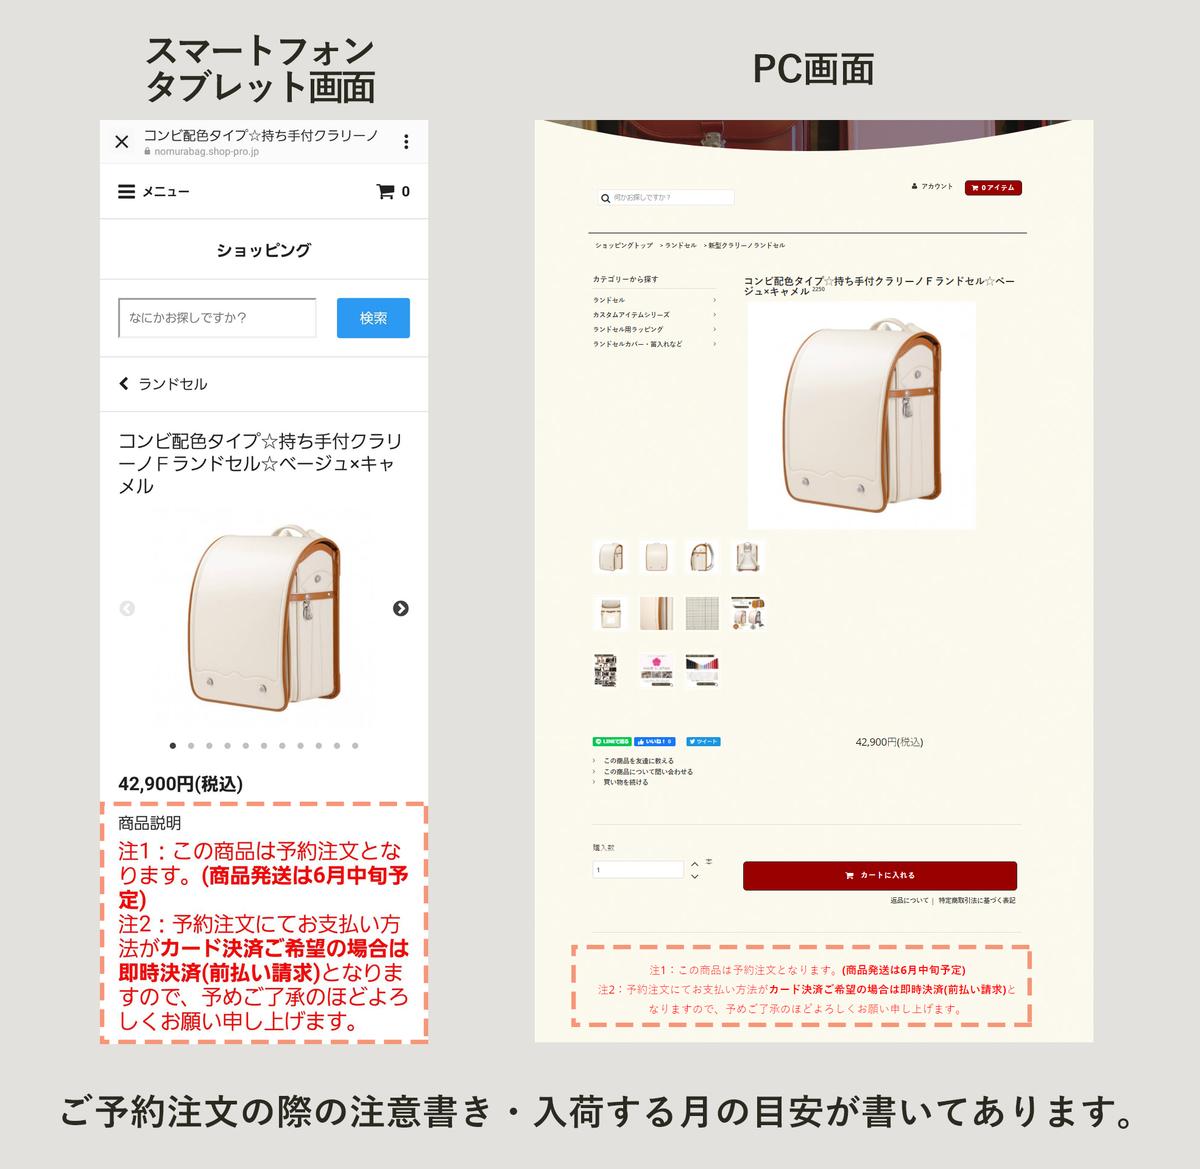 f:id:nomura-randsel:20210401095942j:plain